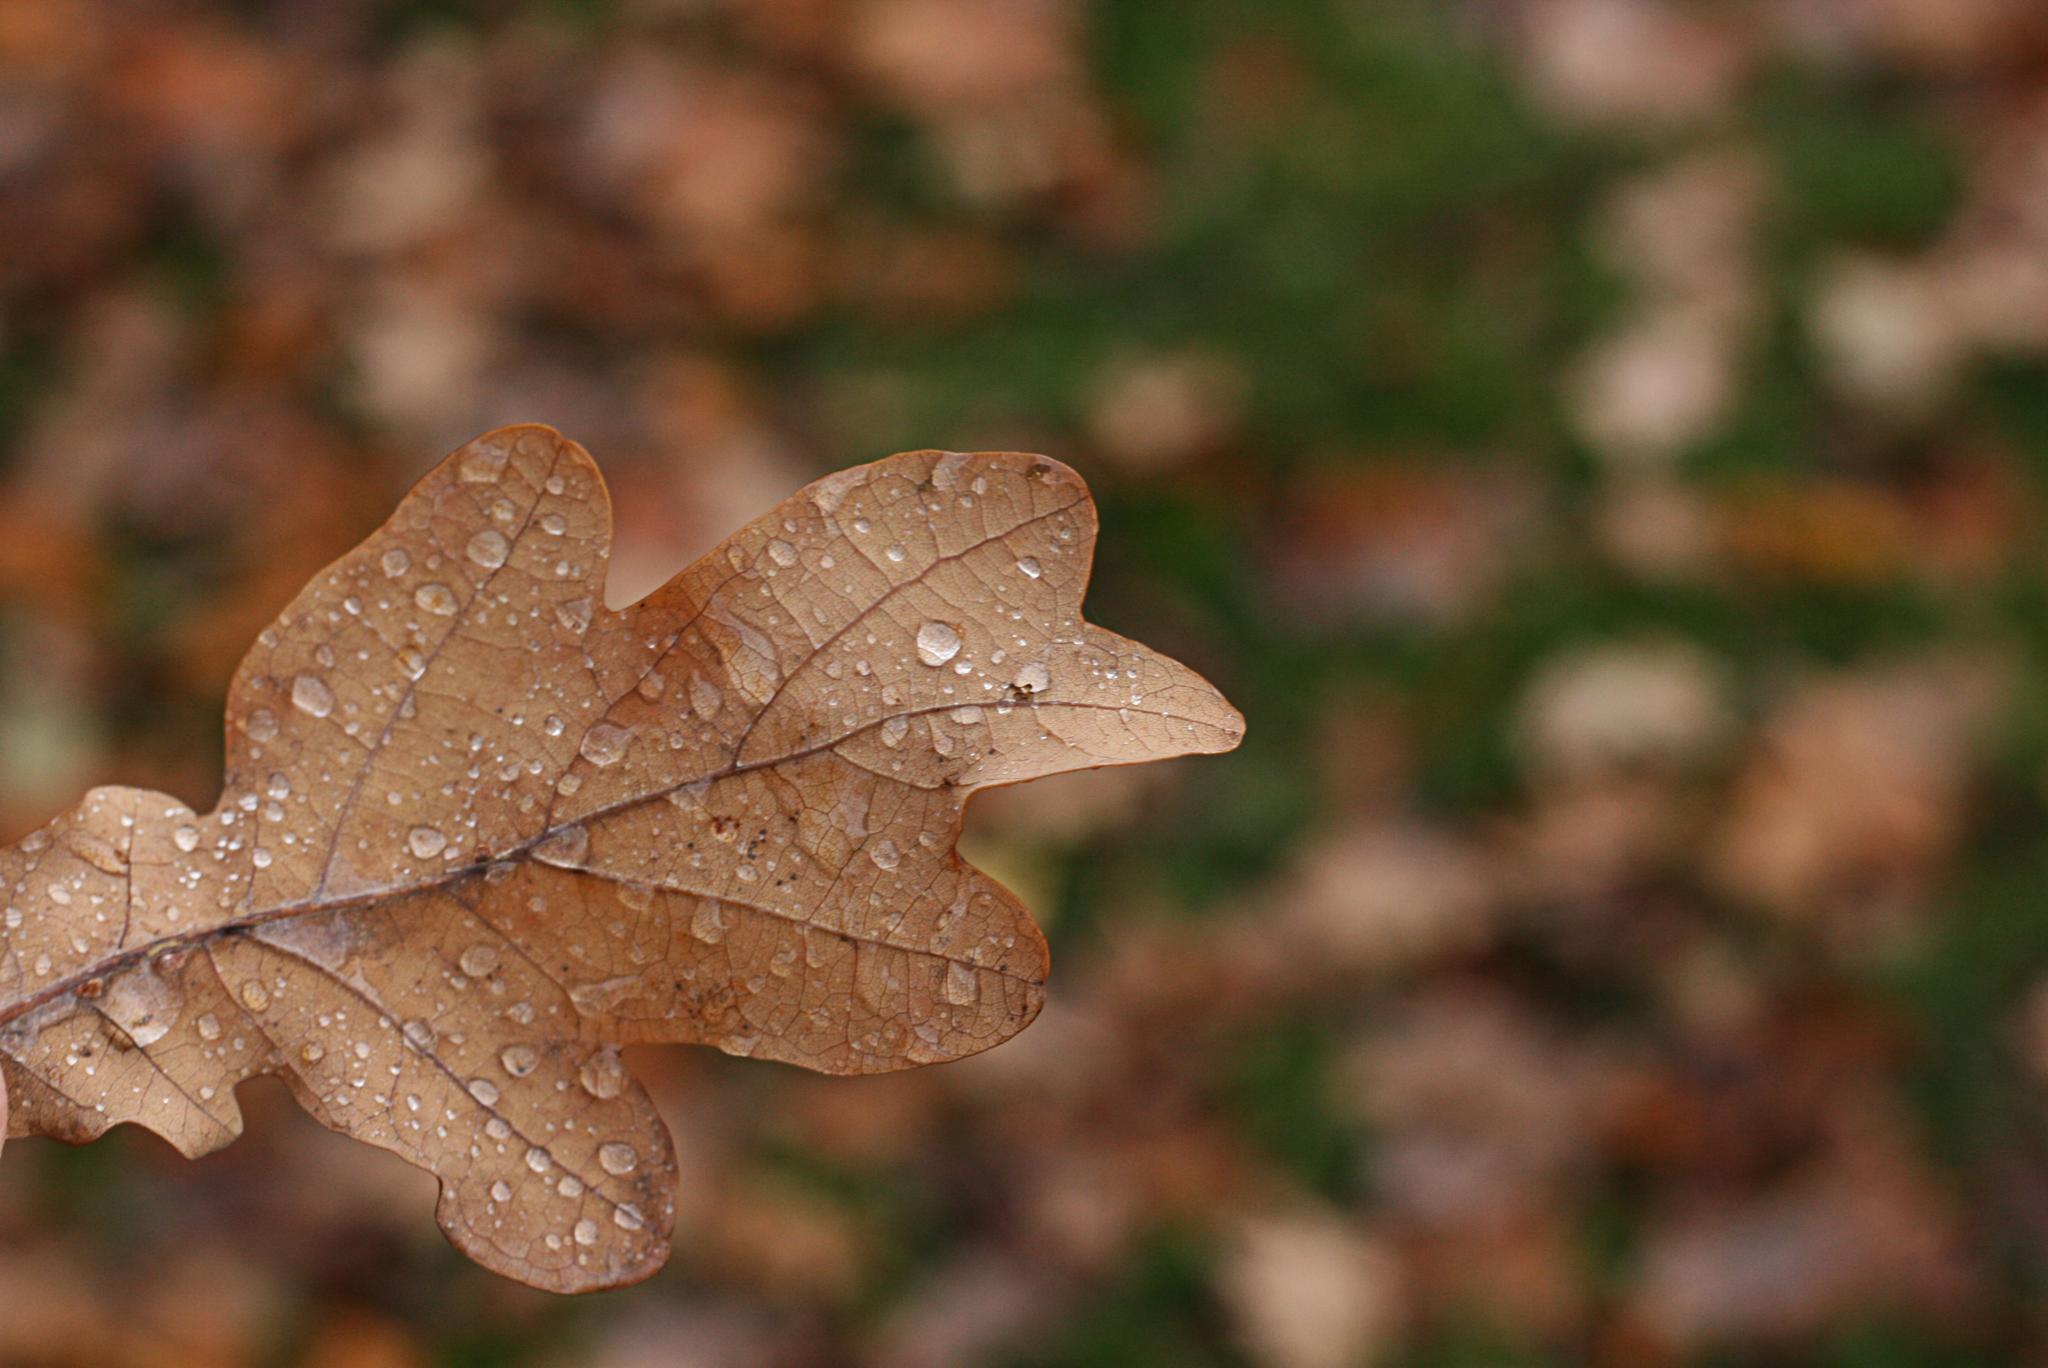 Rain droplets by Zenonas Meškauskas